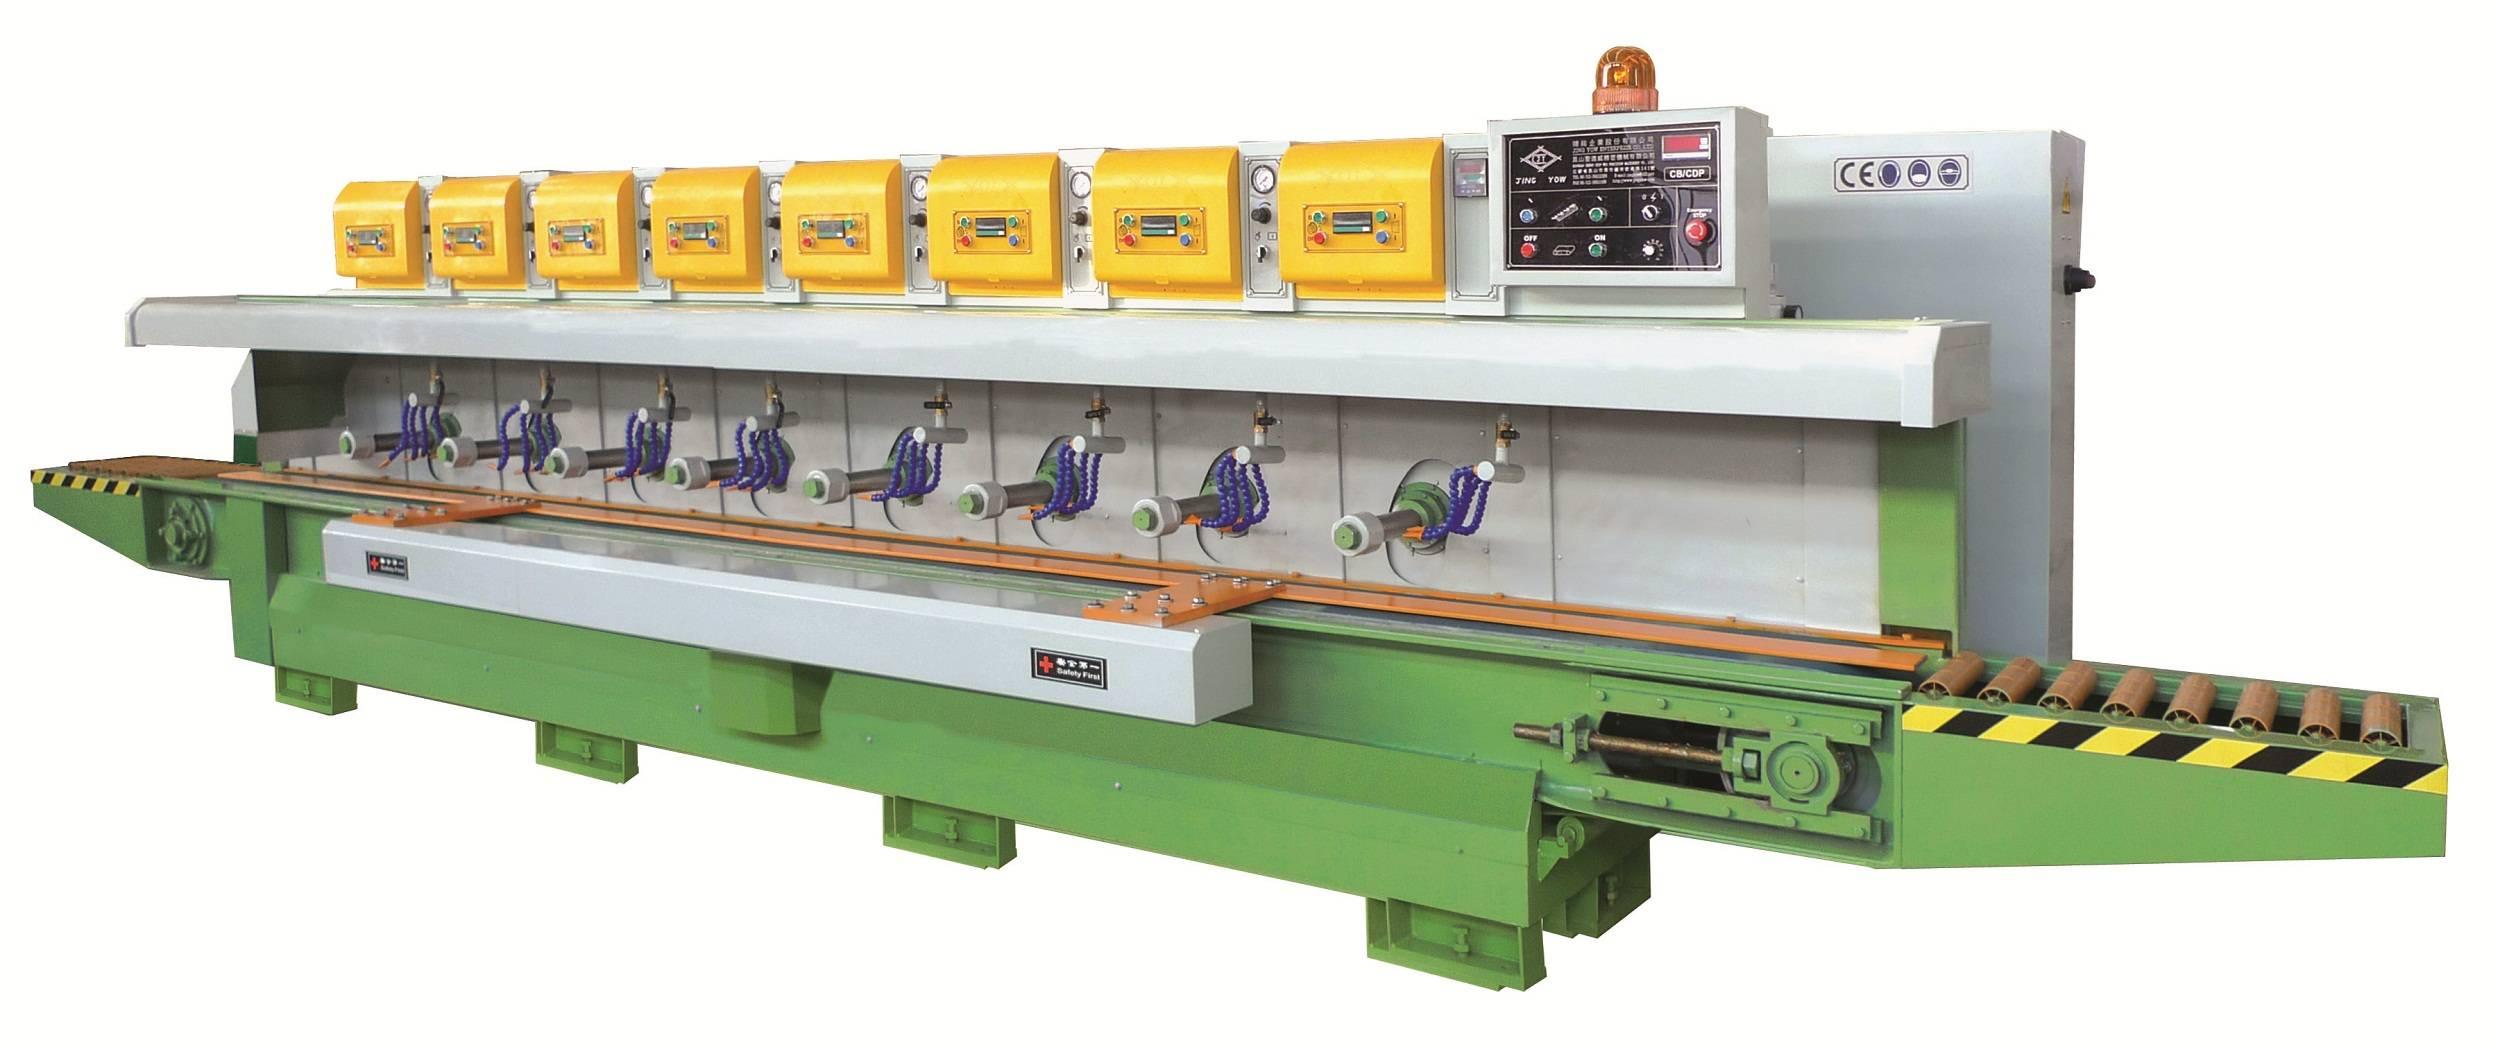 8 Heads Line Processing Machine(Polishing) CB/CDPM-8